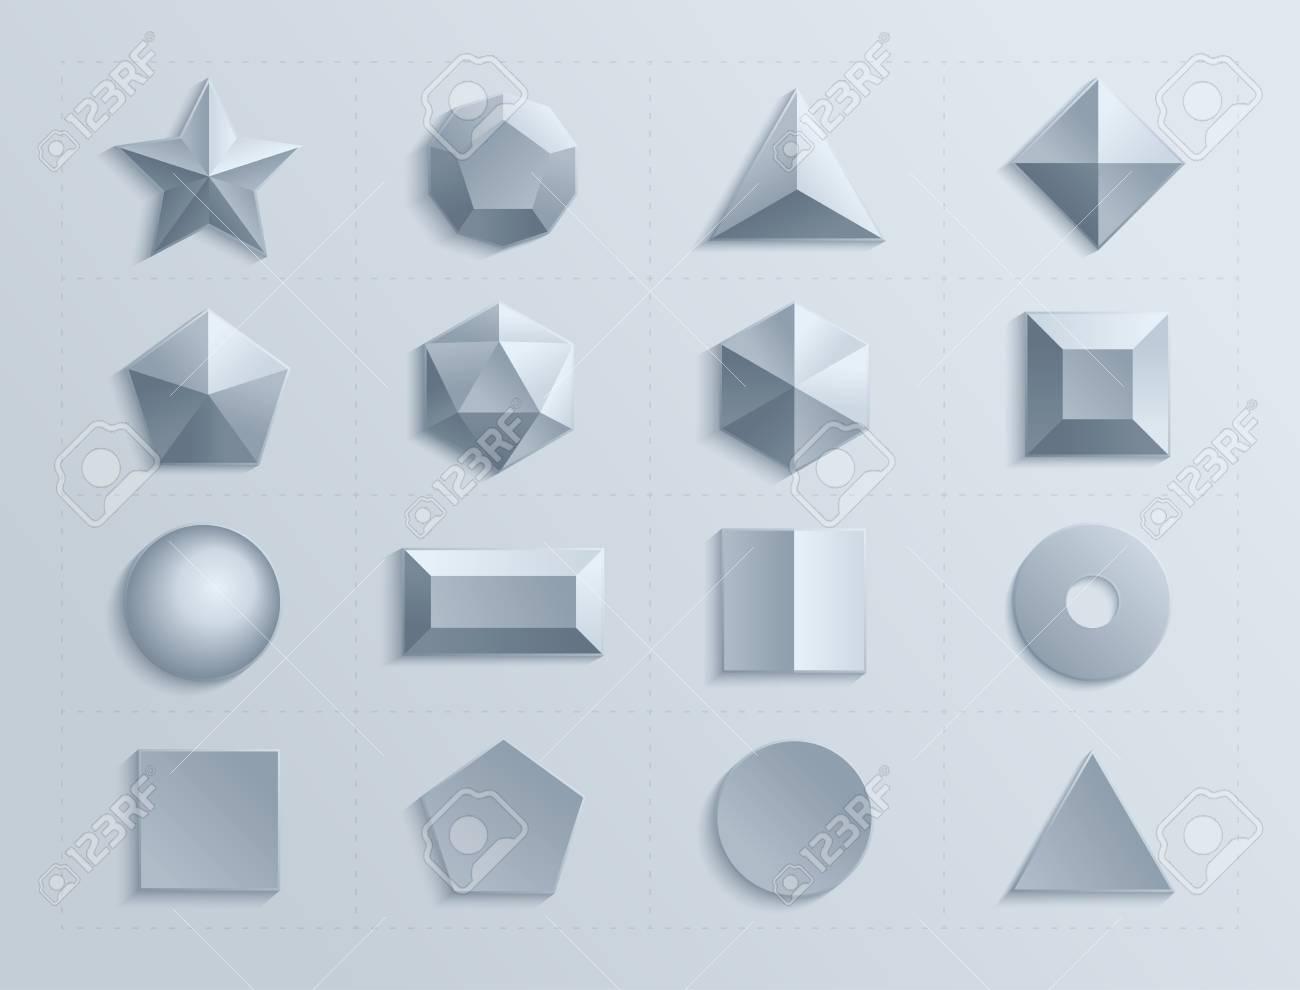 3d shapes template realistic with shadow  Geometric shape figure